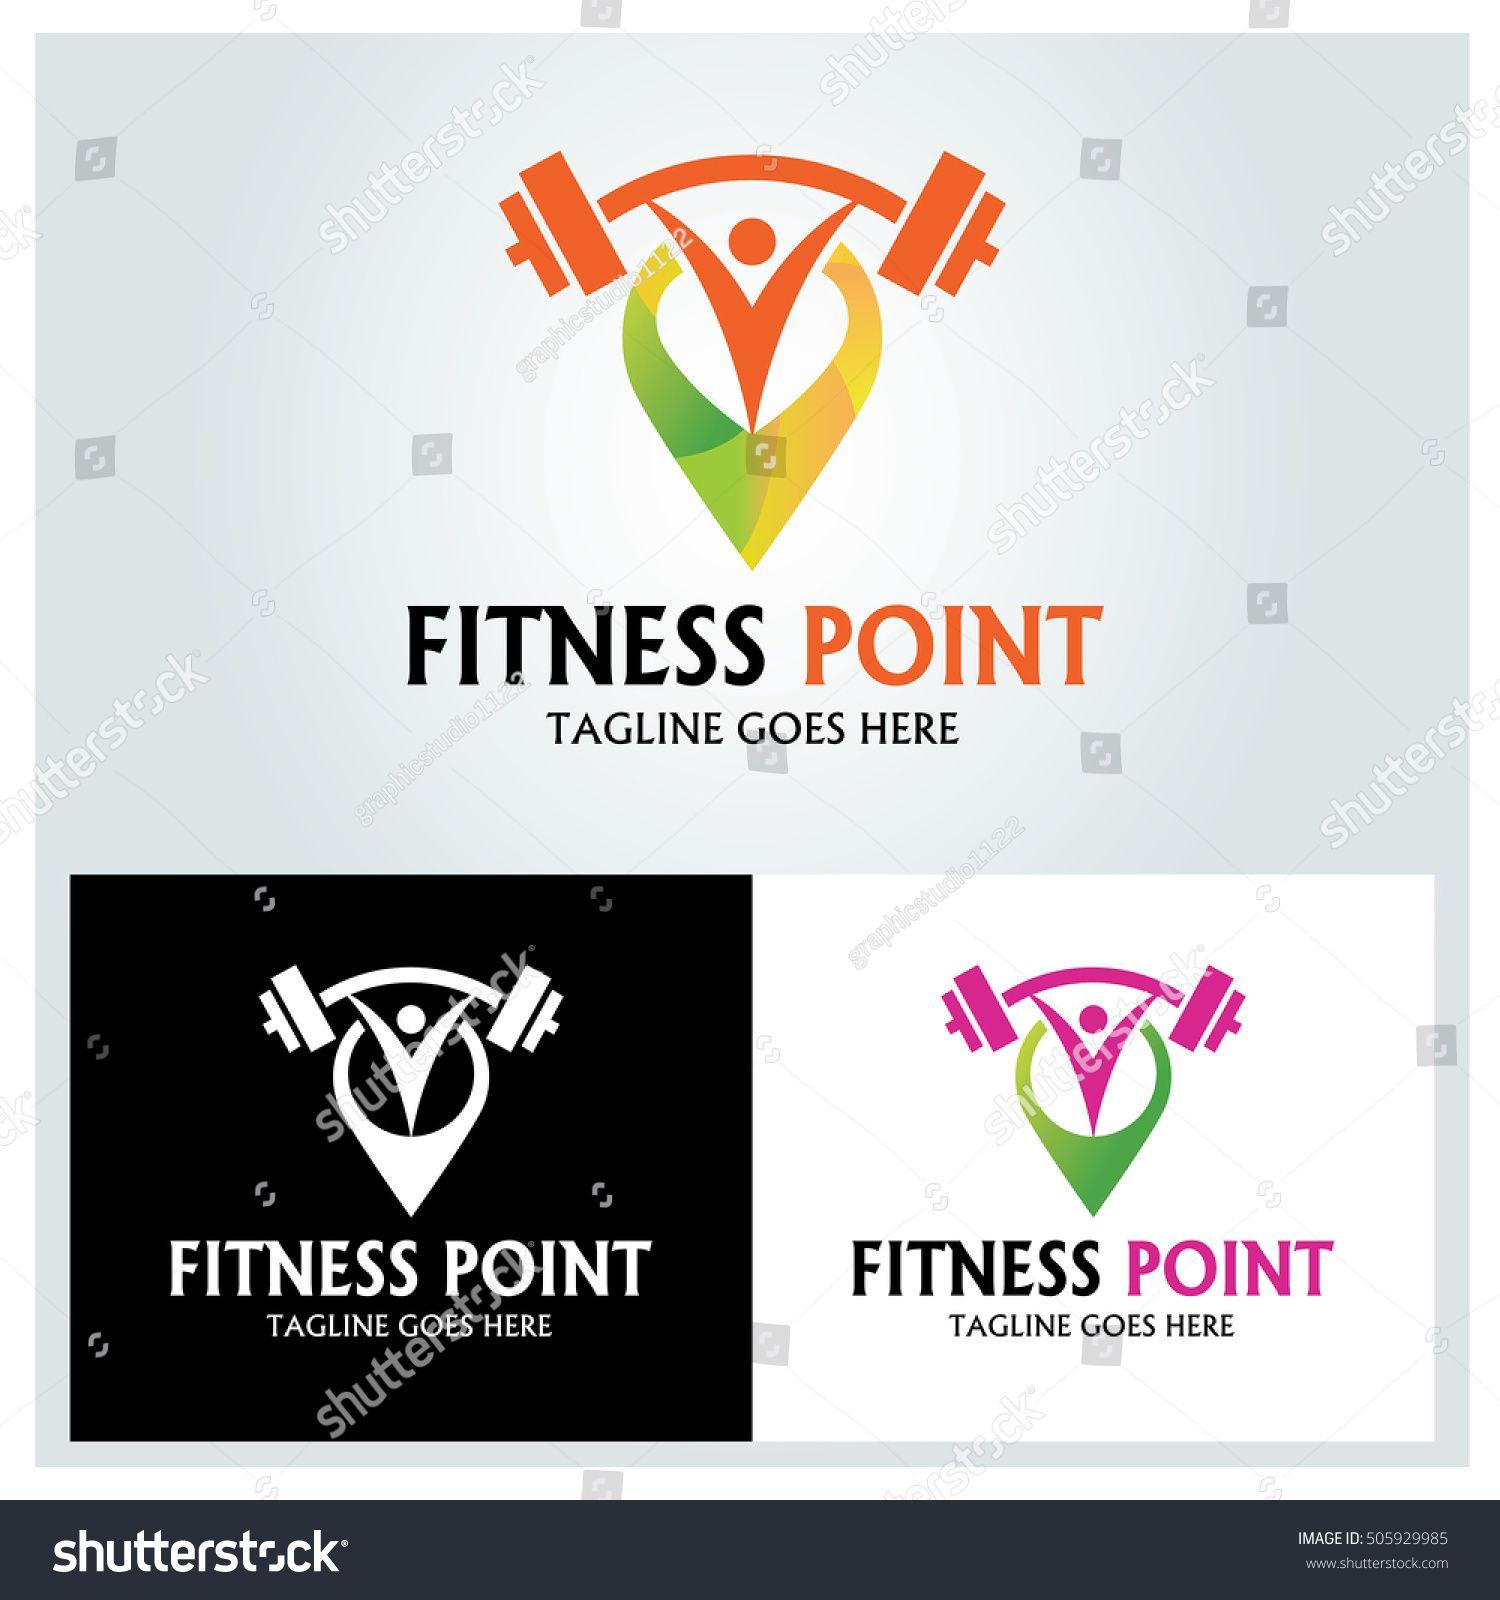 Fitness Point Logo Design Template Gym Point Logo Design Concept Vector Illustration Vector Free Fitness